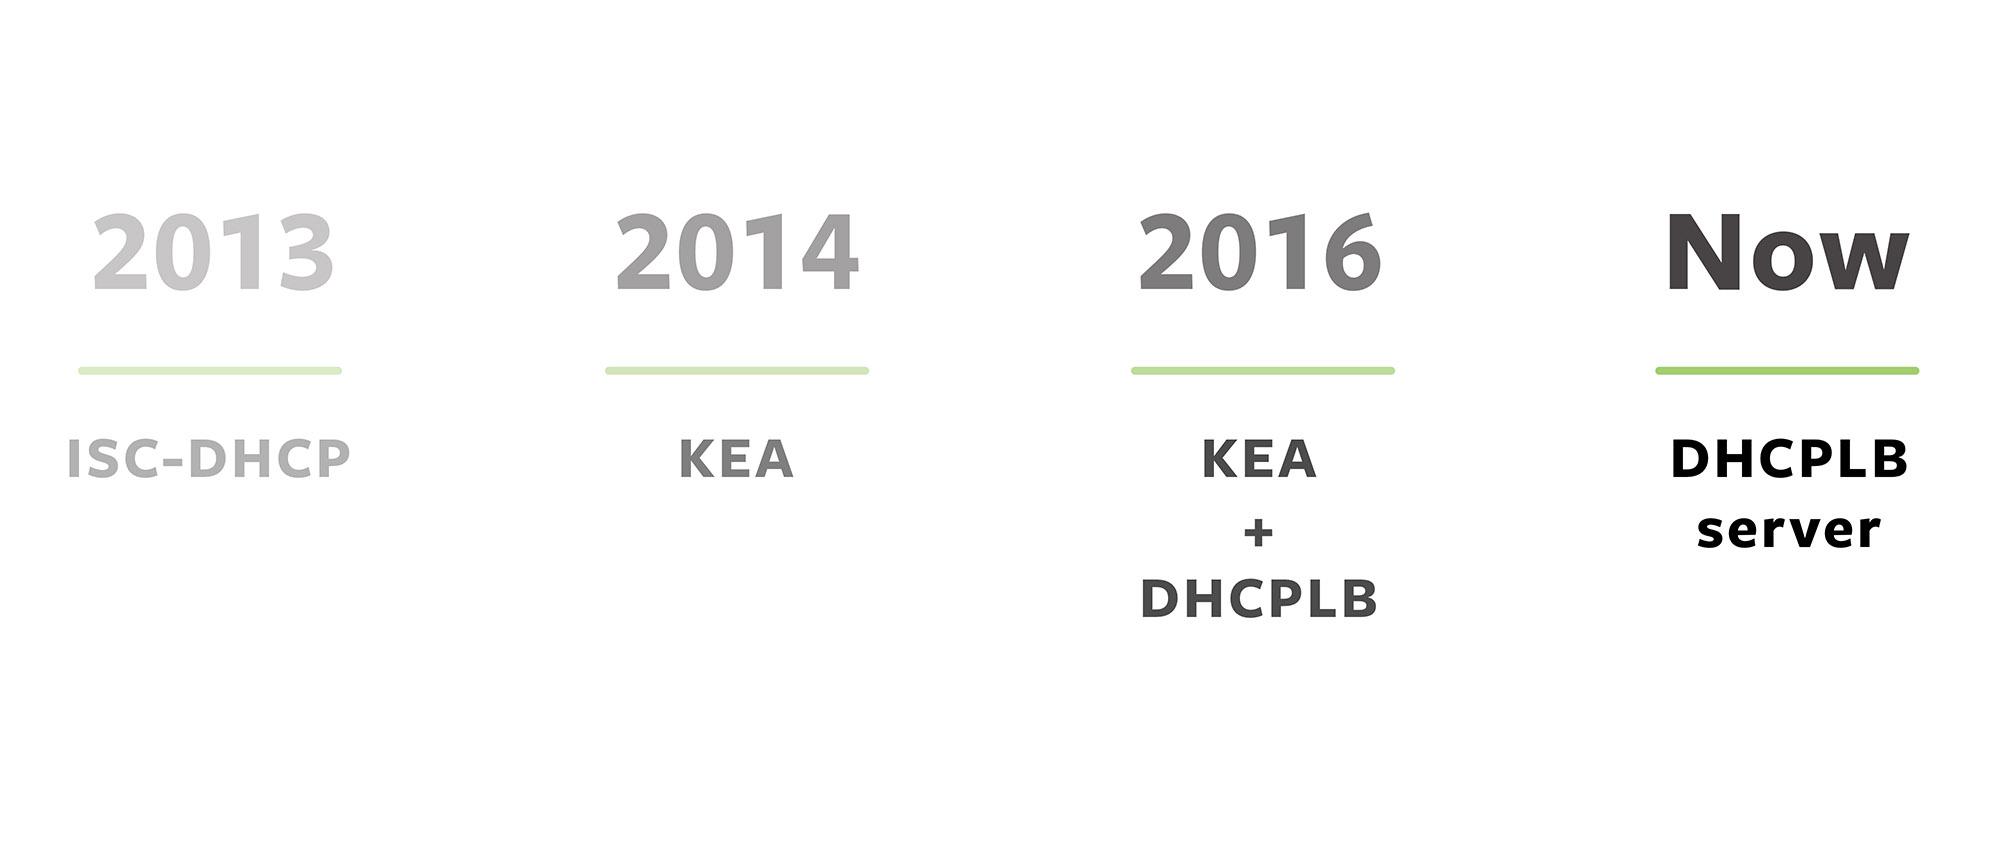 Evolution of Facebook's DHCP Infrastructure